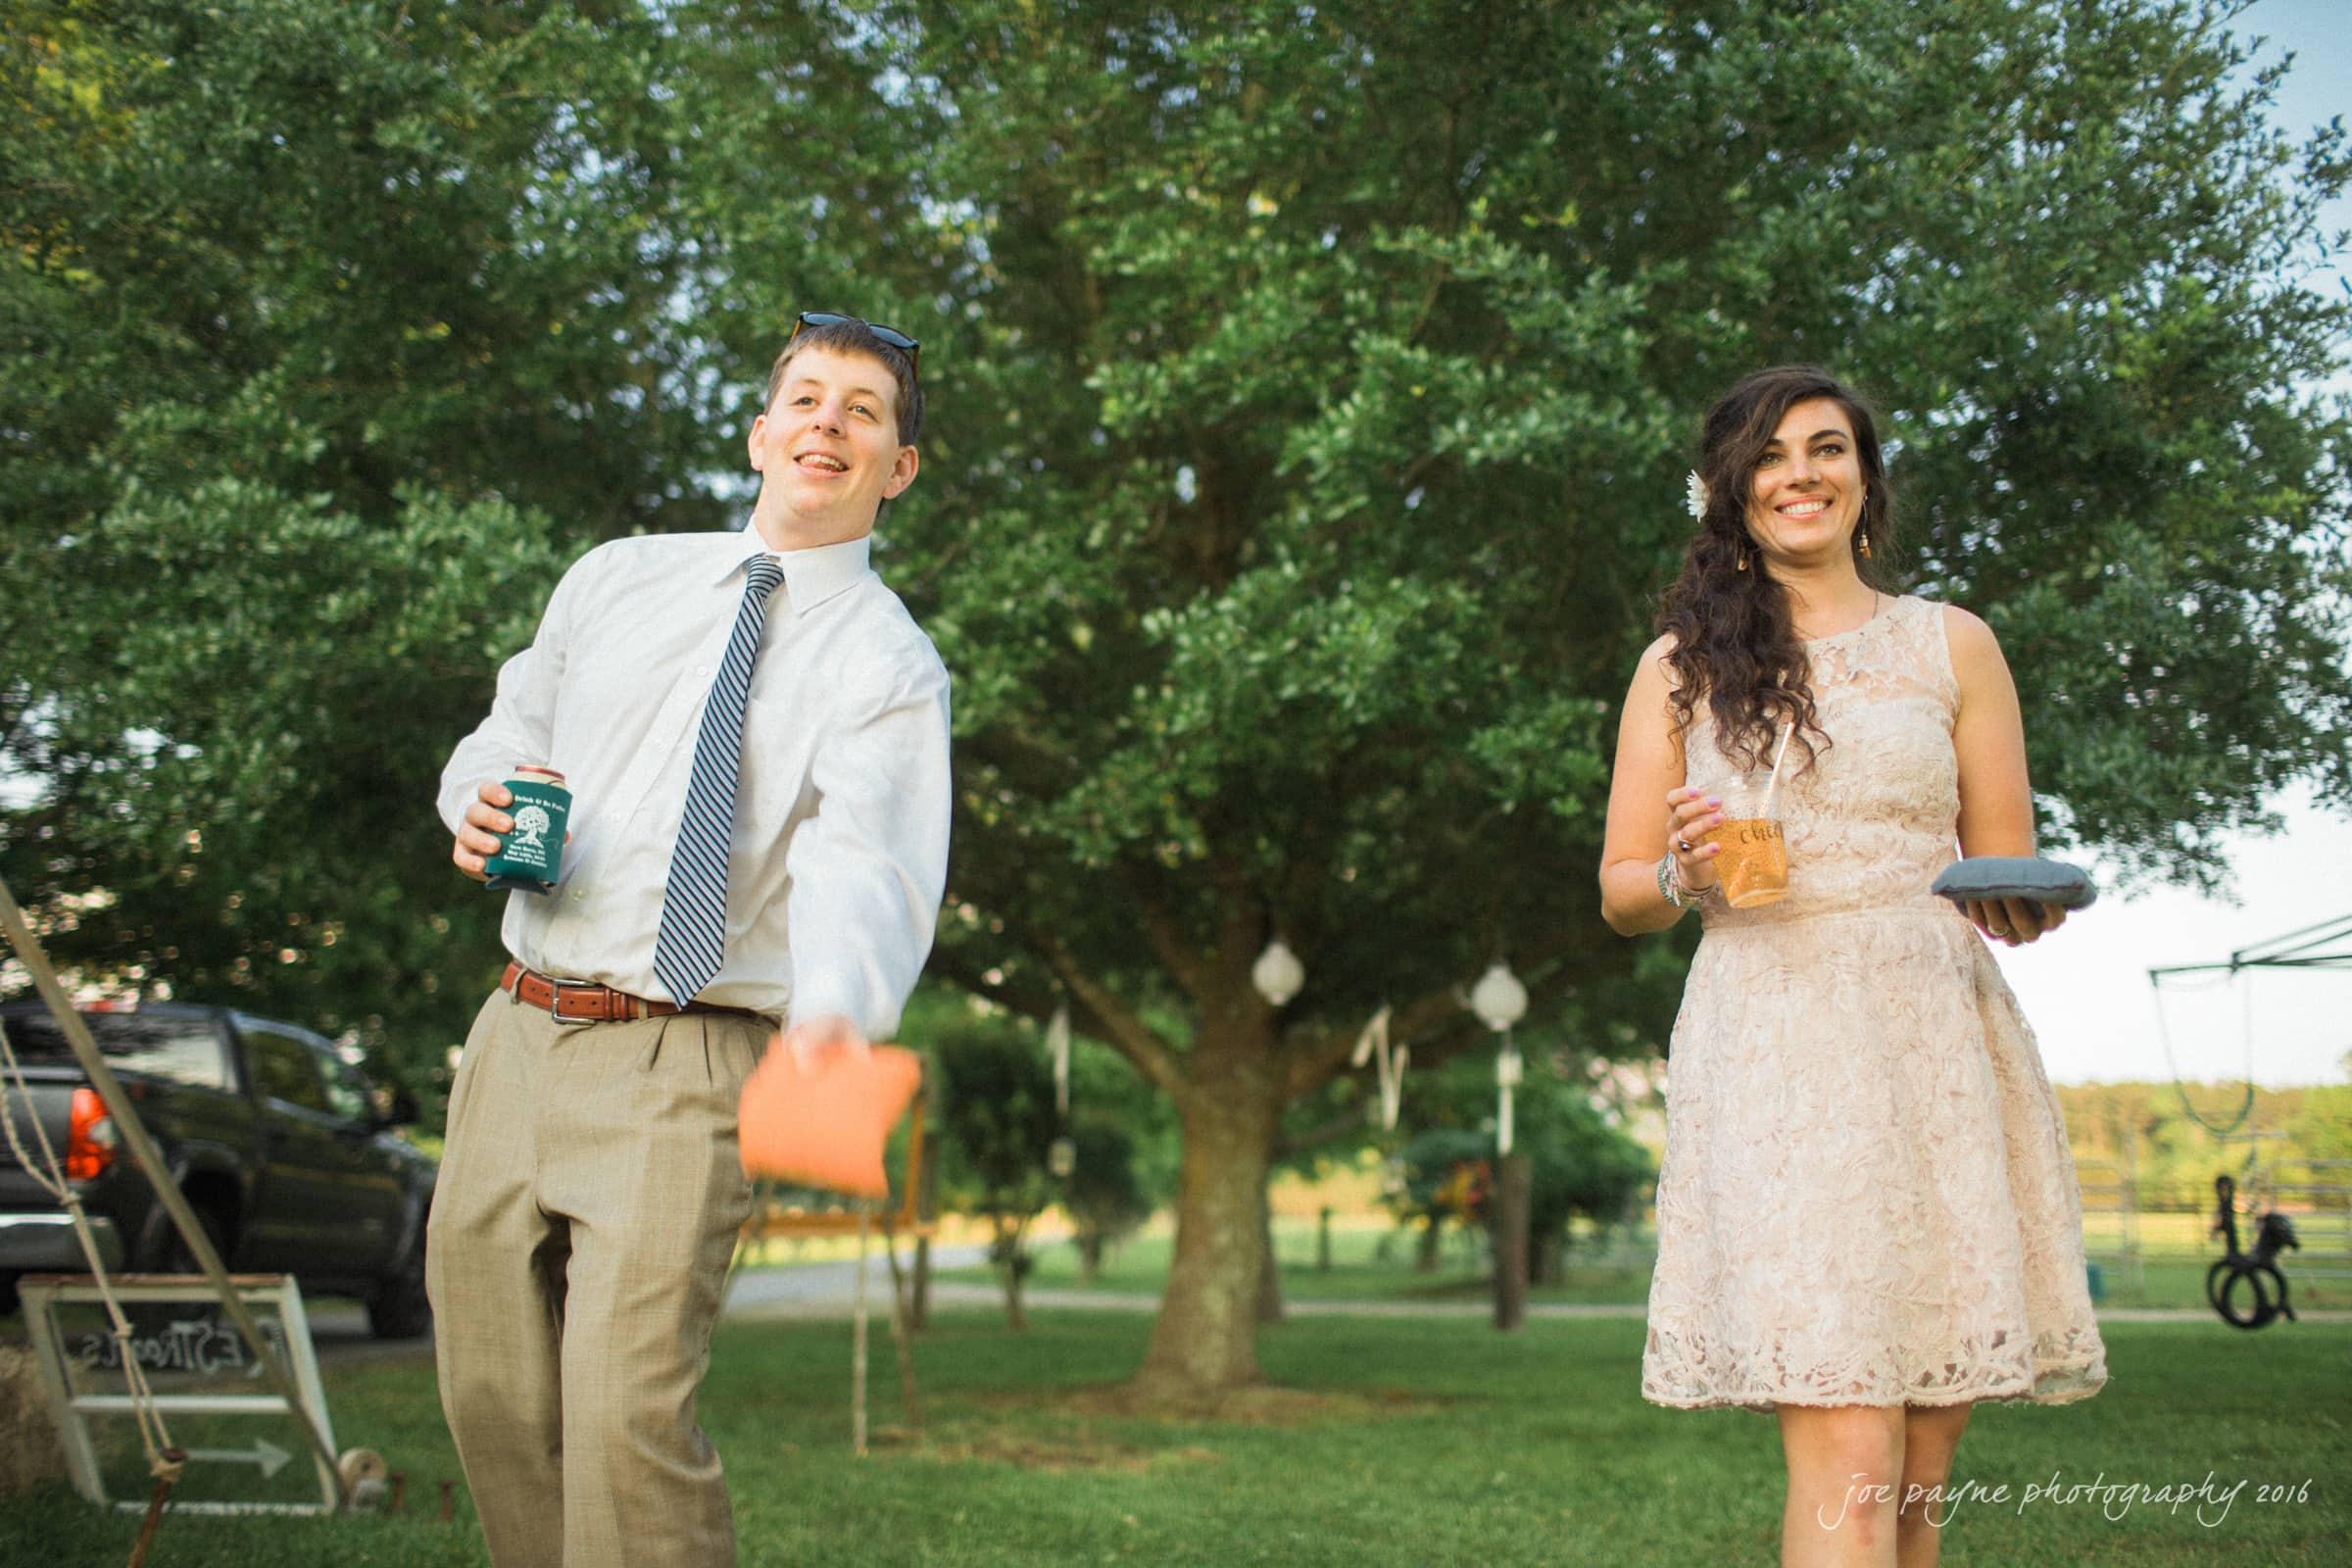 New Bern Wedding Photography - Jessica & Brinson-47